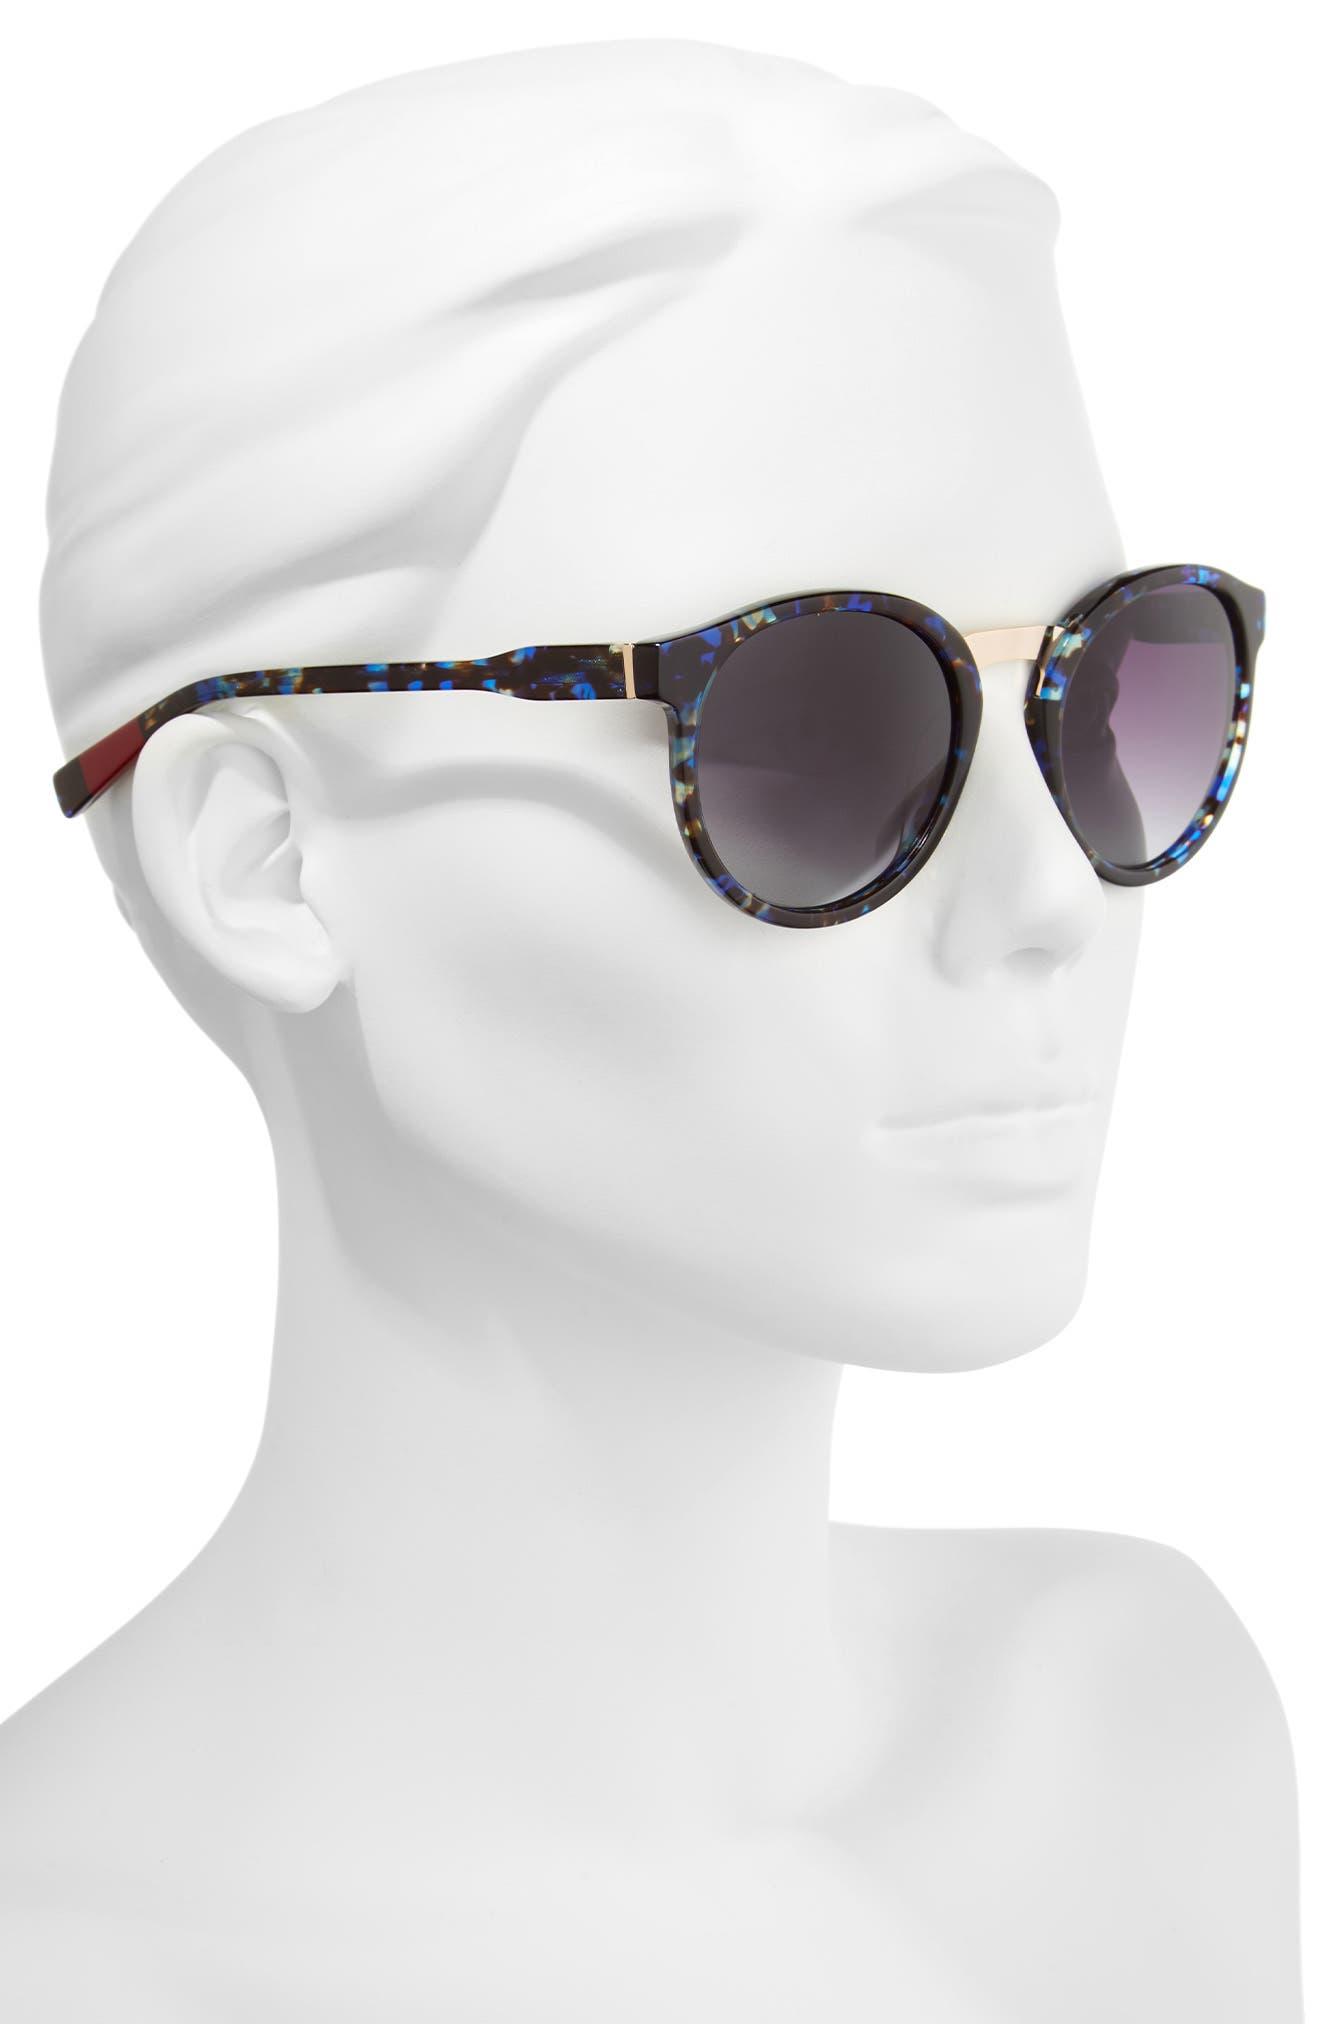 53mm Round Sunglasses,                             Alternate thumbnail 2, color,                             Blue Tortoise